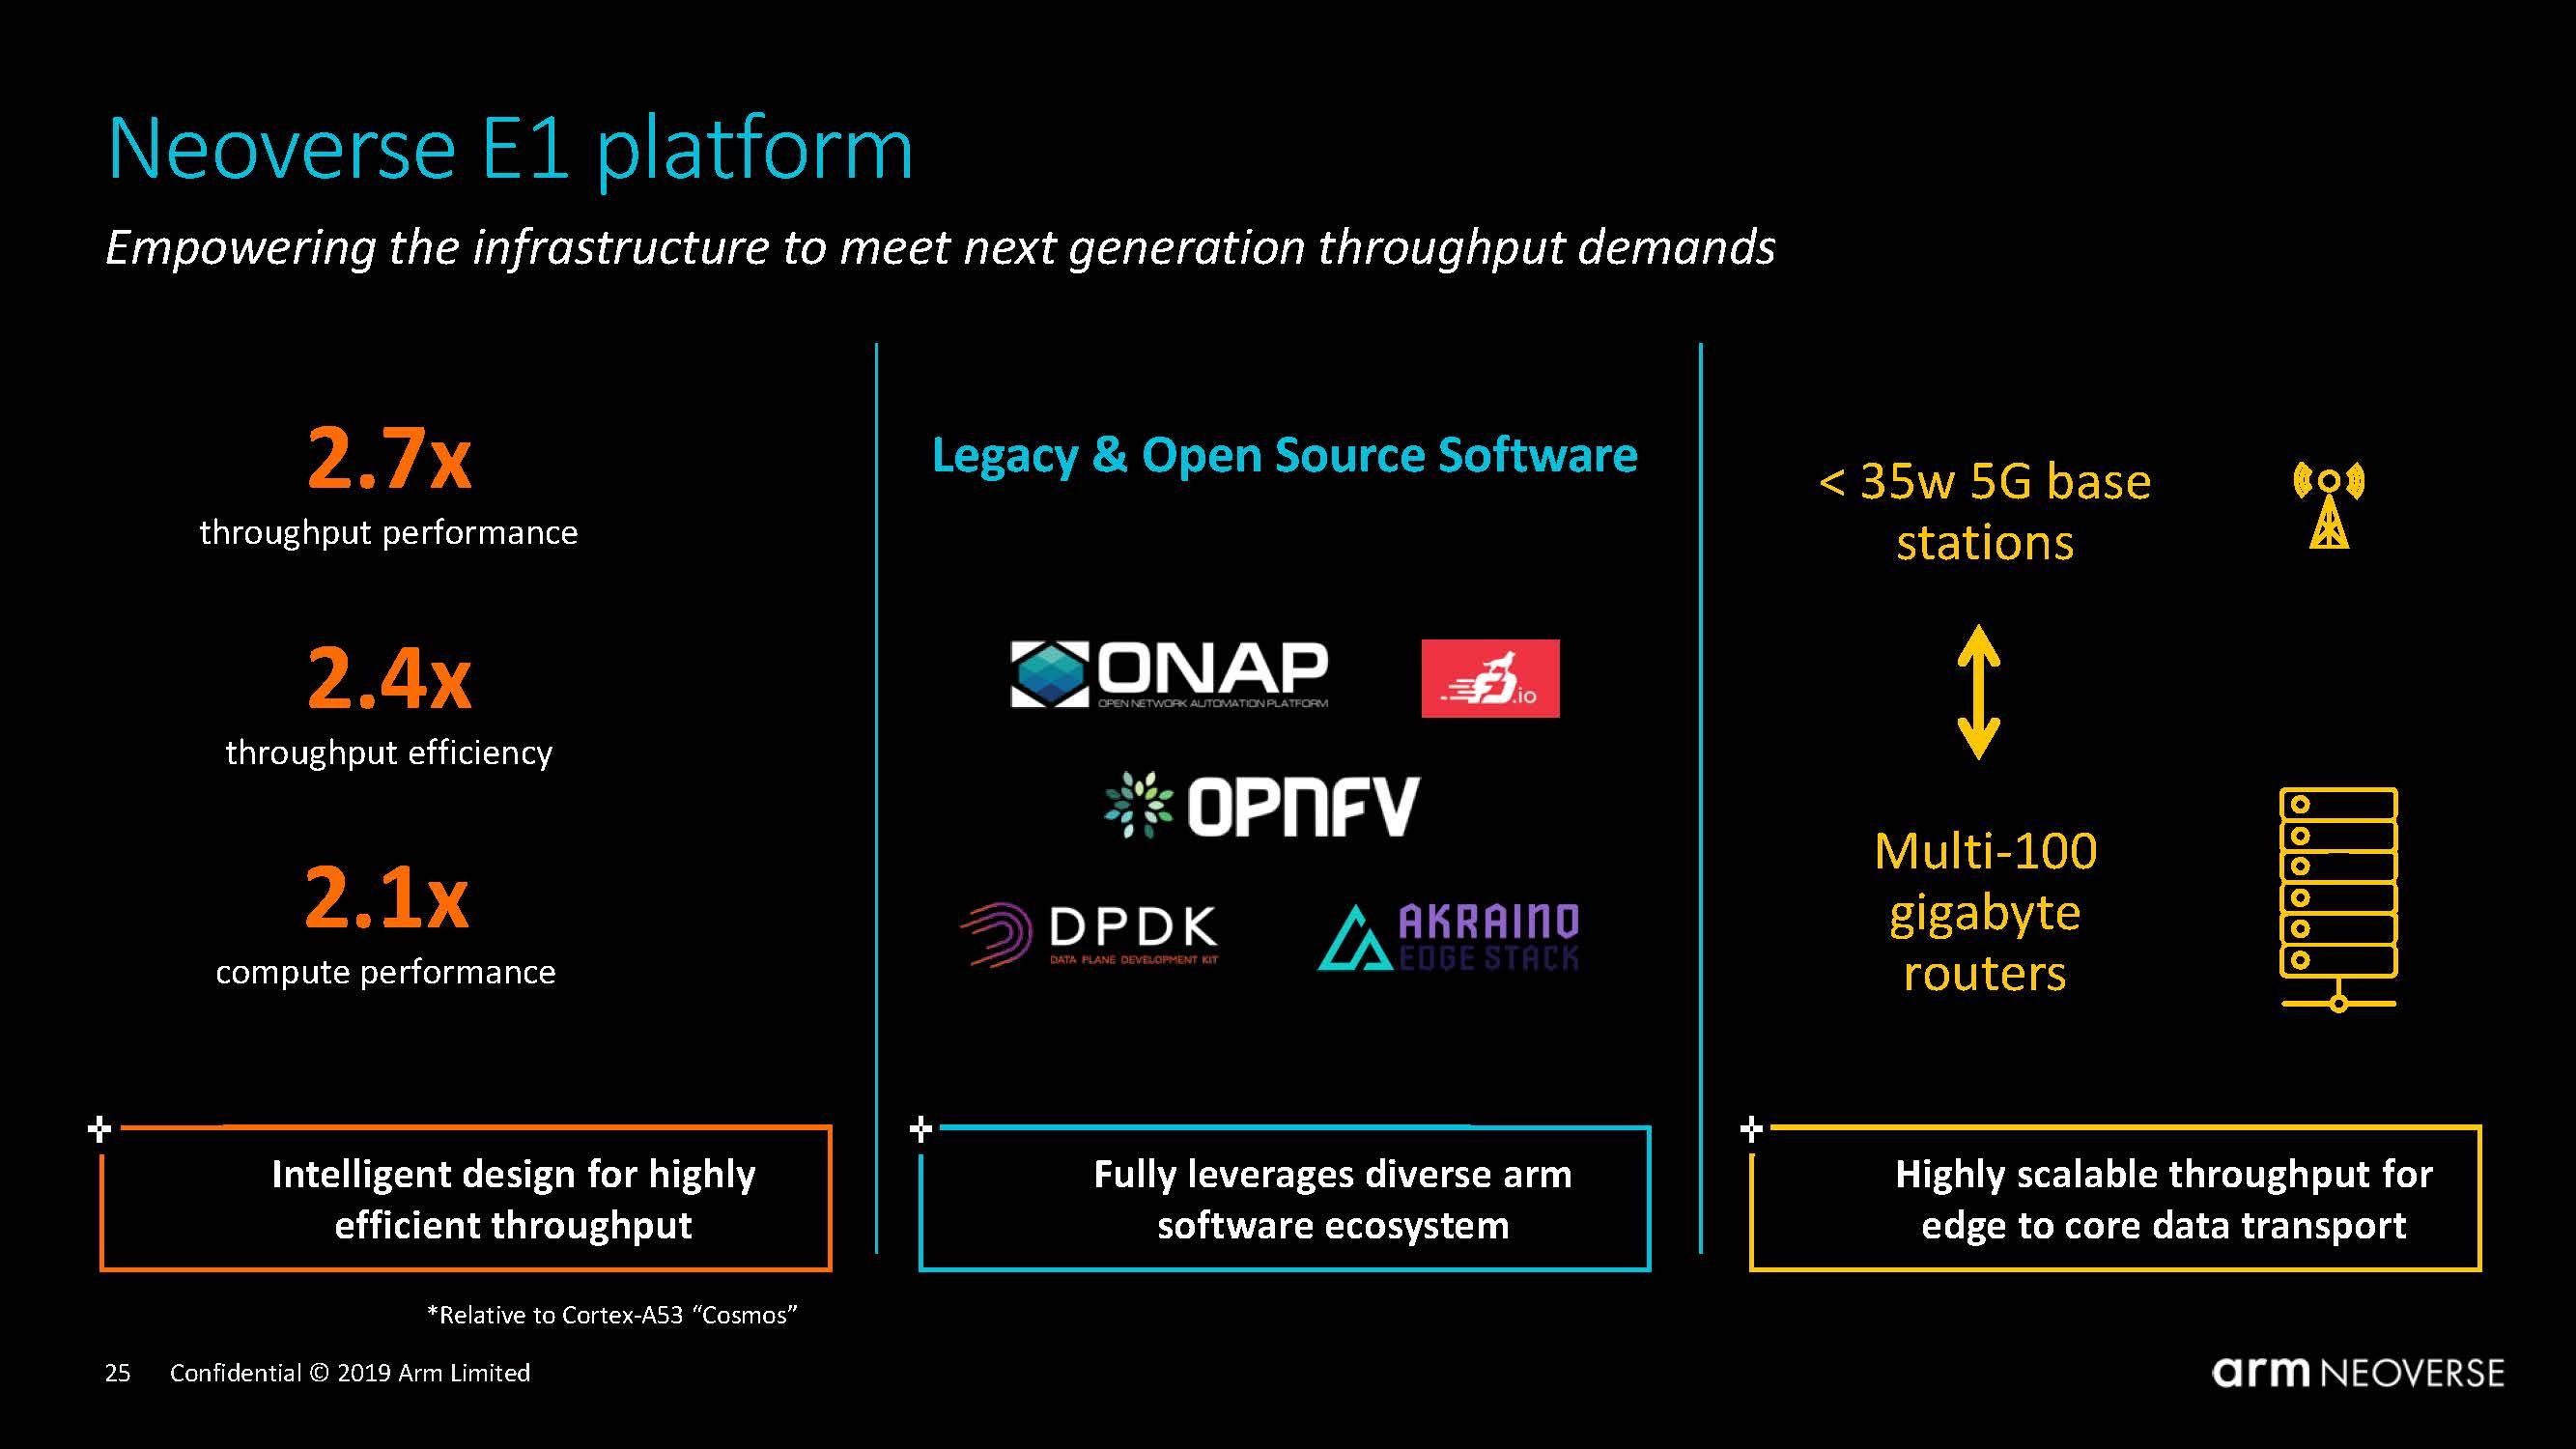 Arm Neoverse Tech Day 2019 Neoverse E1 Platform Ecosystem